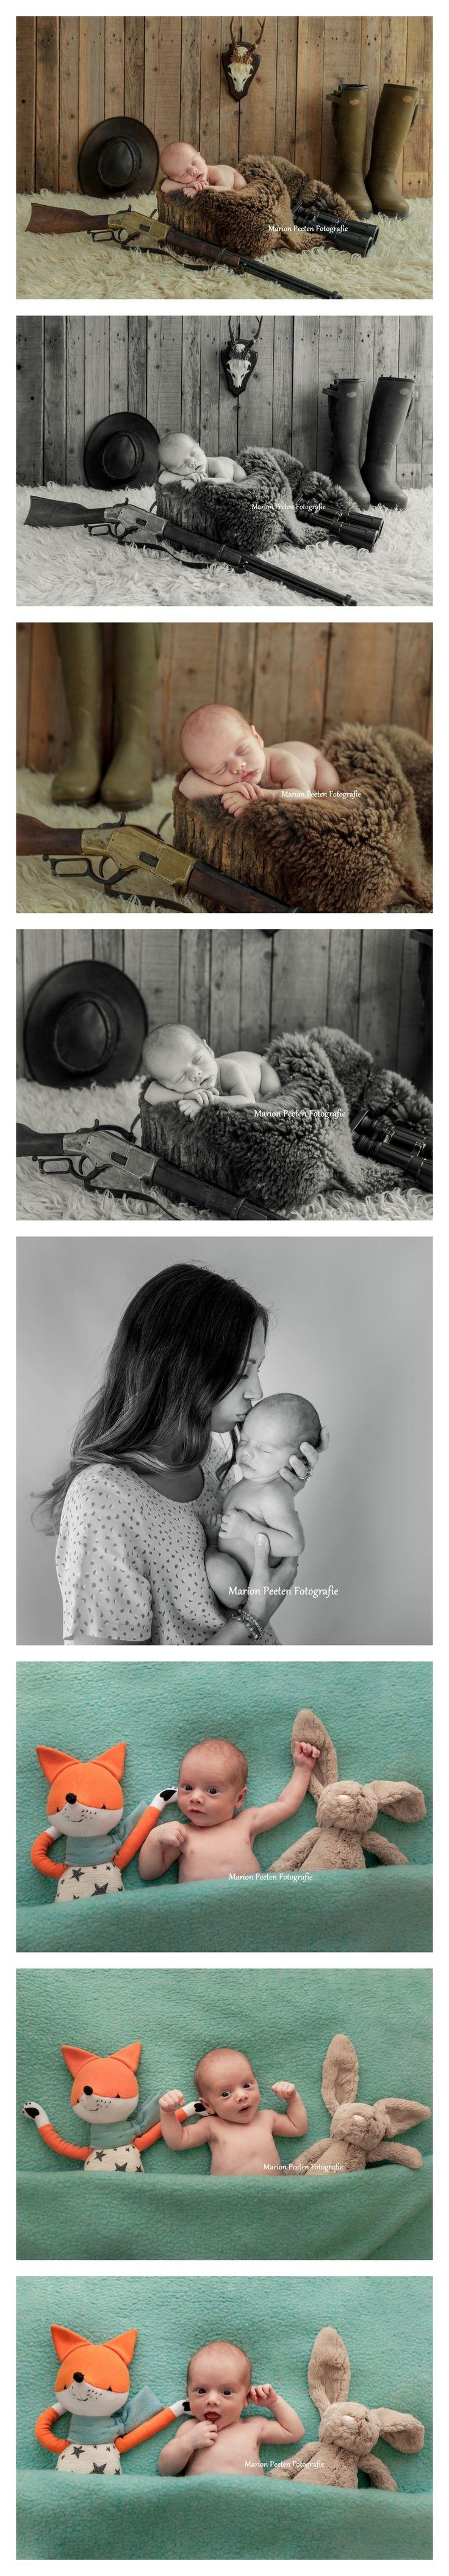 Newborn baby boy#newborn studio photography#marion peeten fotografie#newborn with hunting gear#newborn love# newborn with mom#